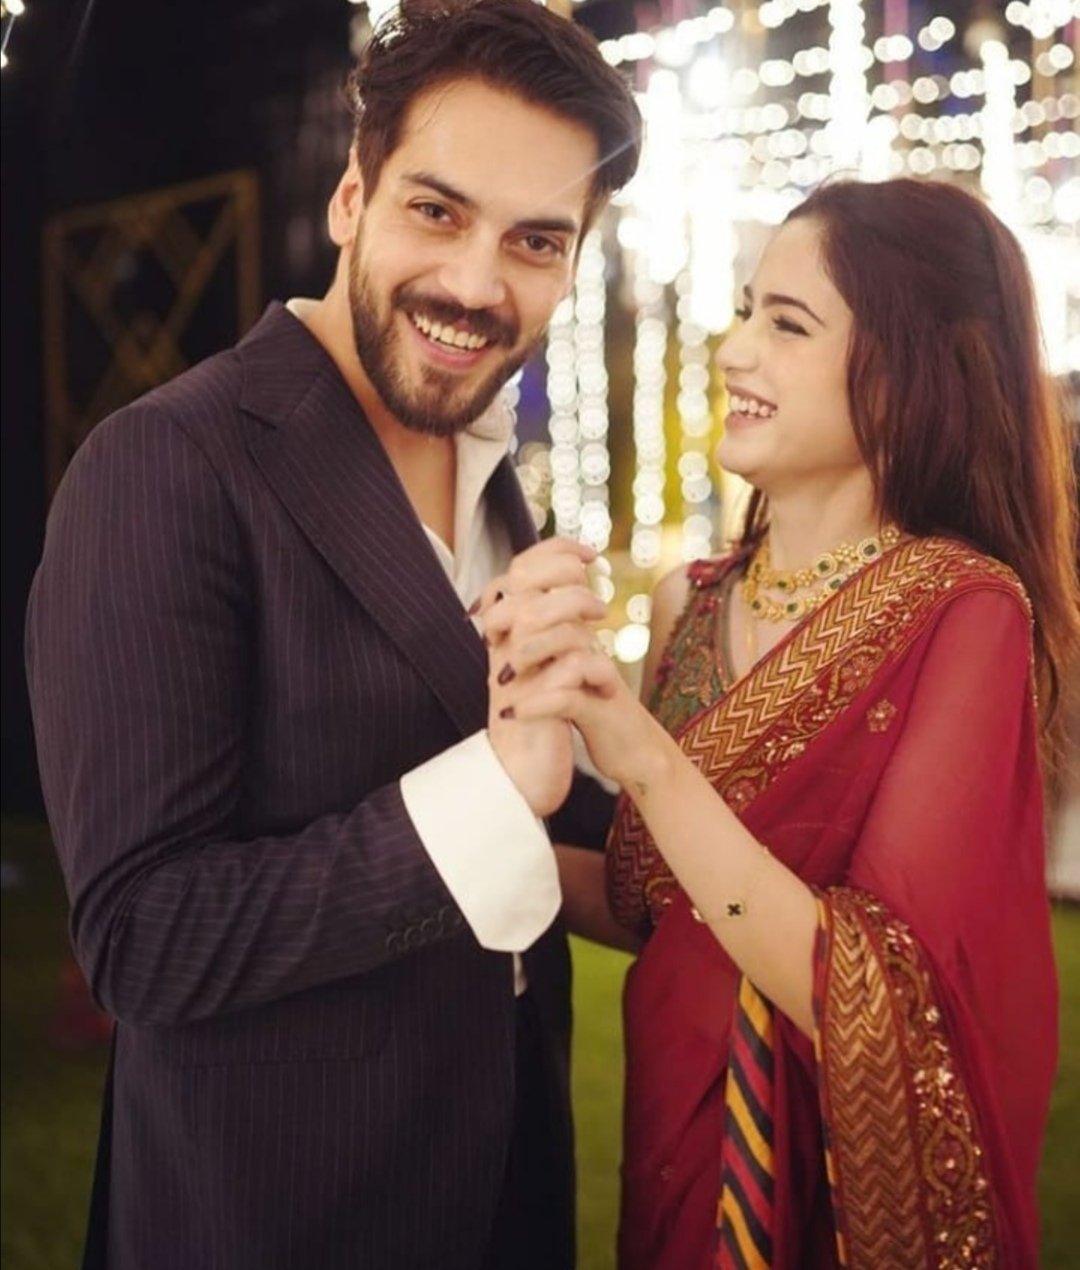 Shahbaz Shigri and Aima Baig Engagement